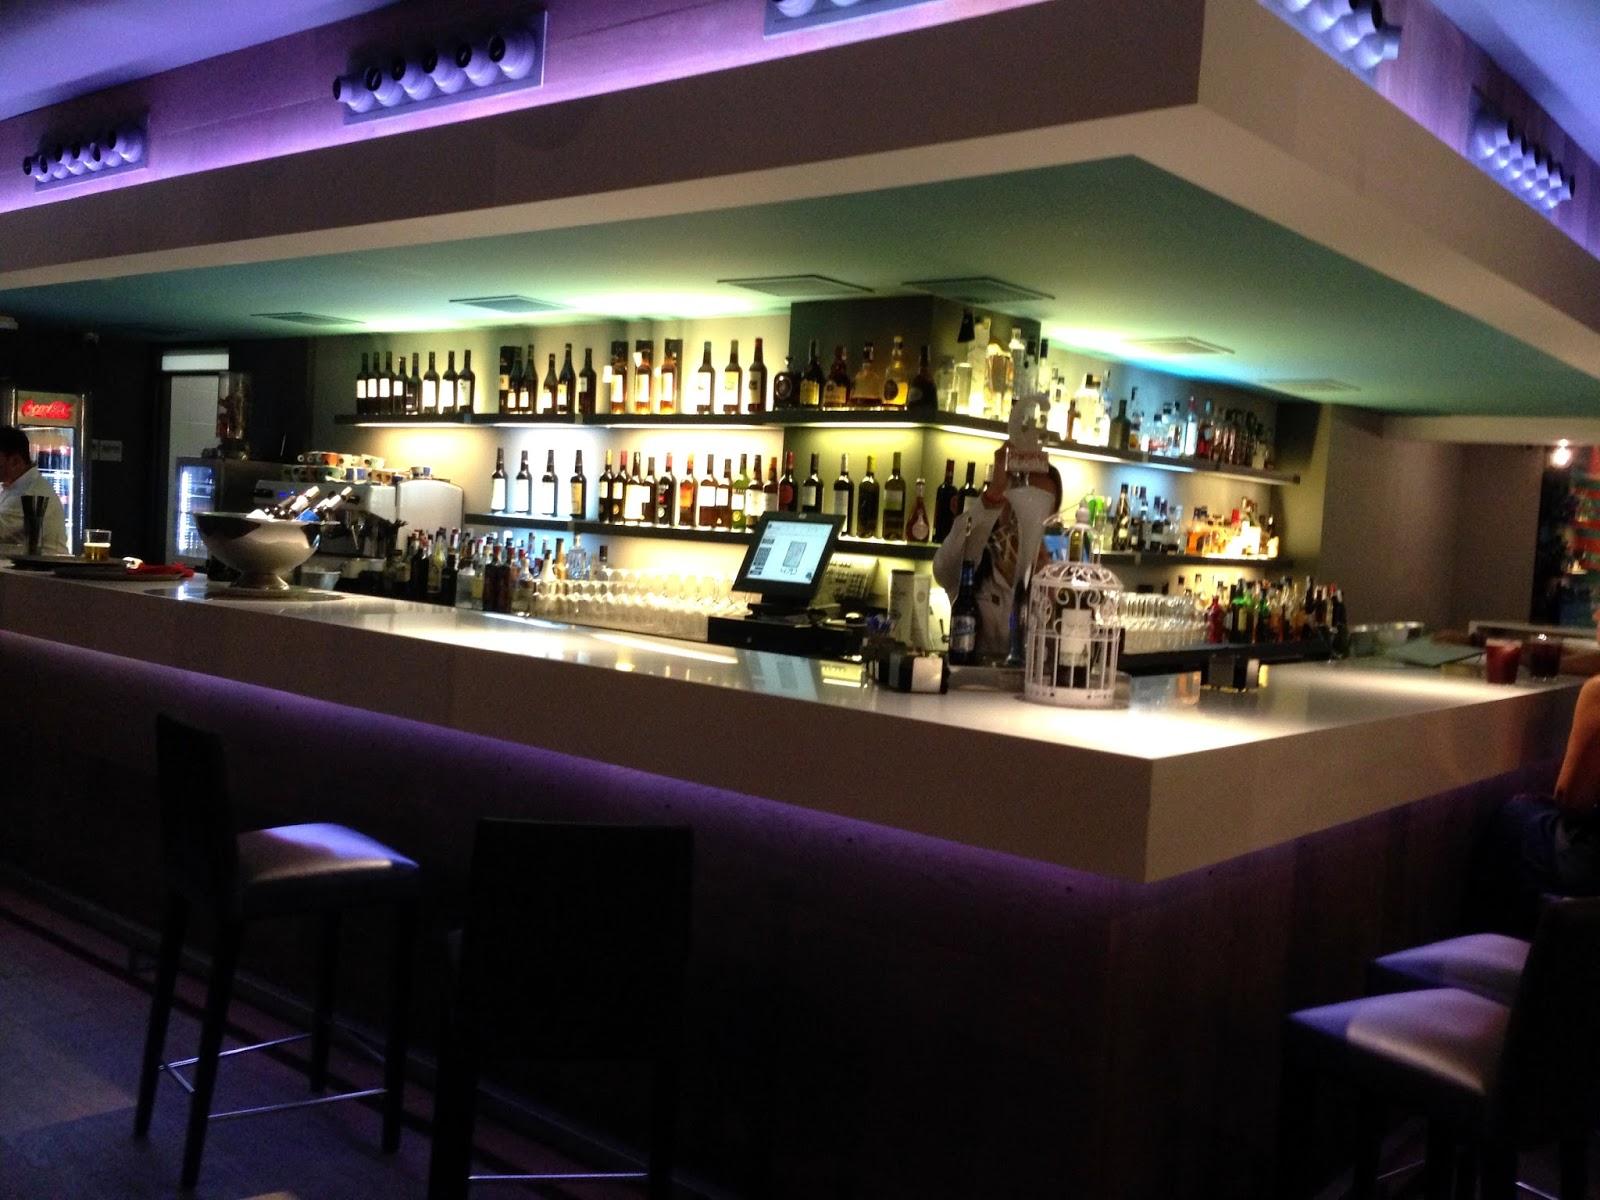 Primero segundo y postre d nde comes hoy los mejores restaurantes para cada ocasi n - Estanterias para bares ...